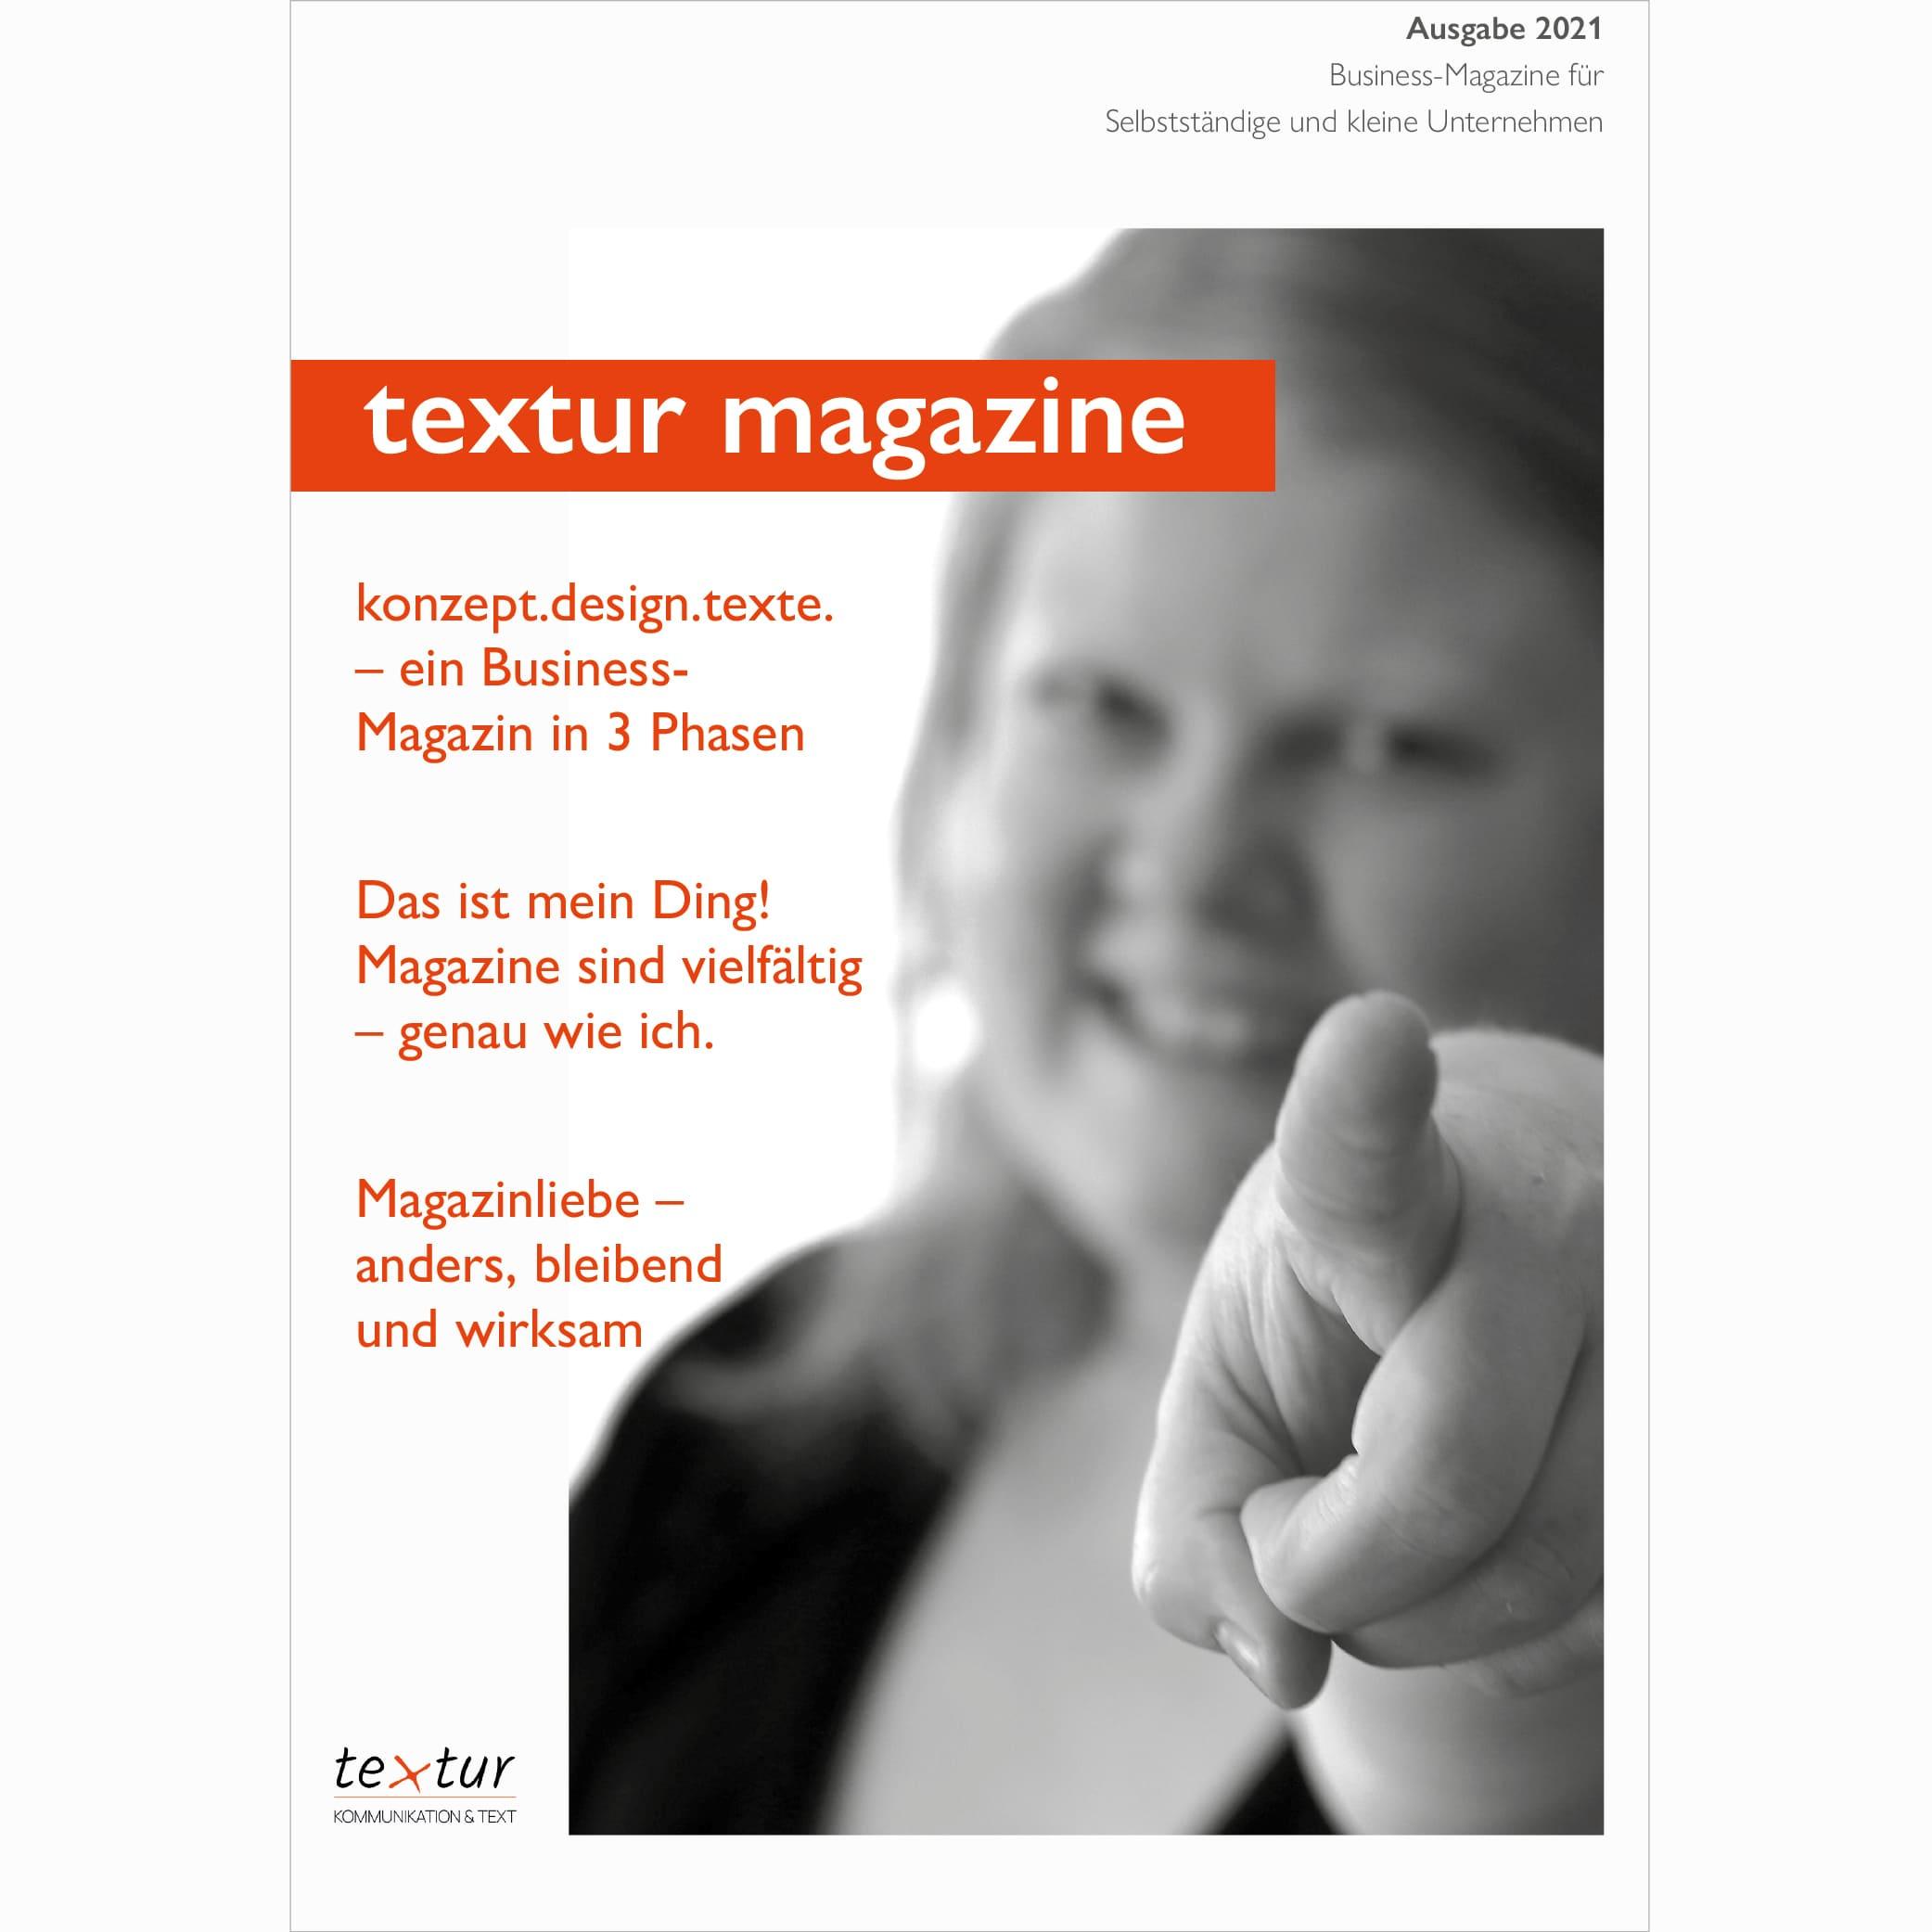 Business-Magazine Referenz Kundenkontakt